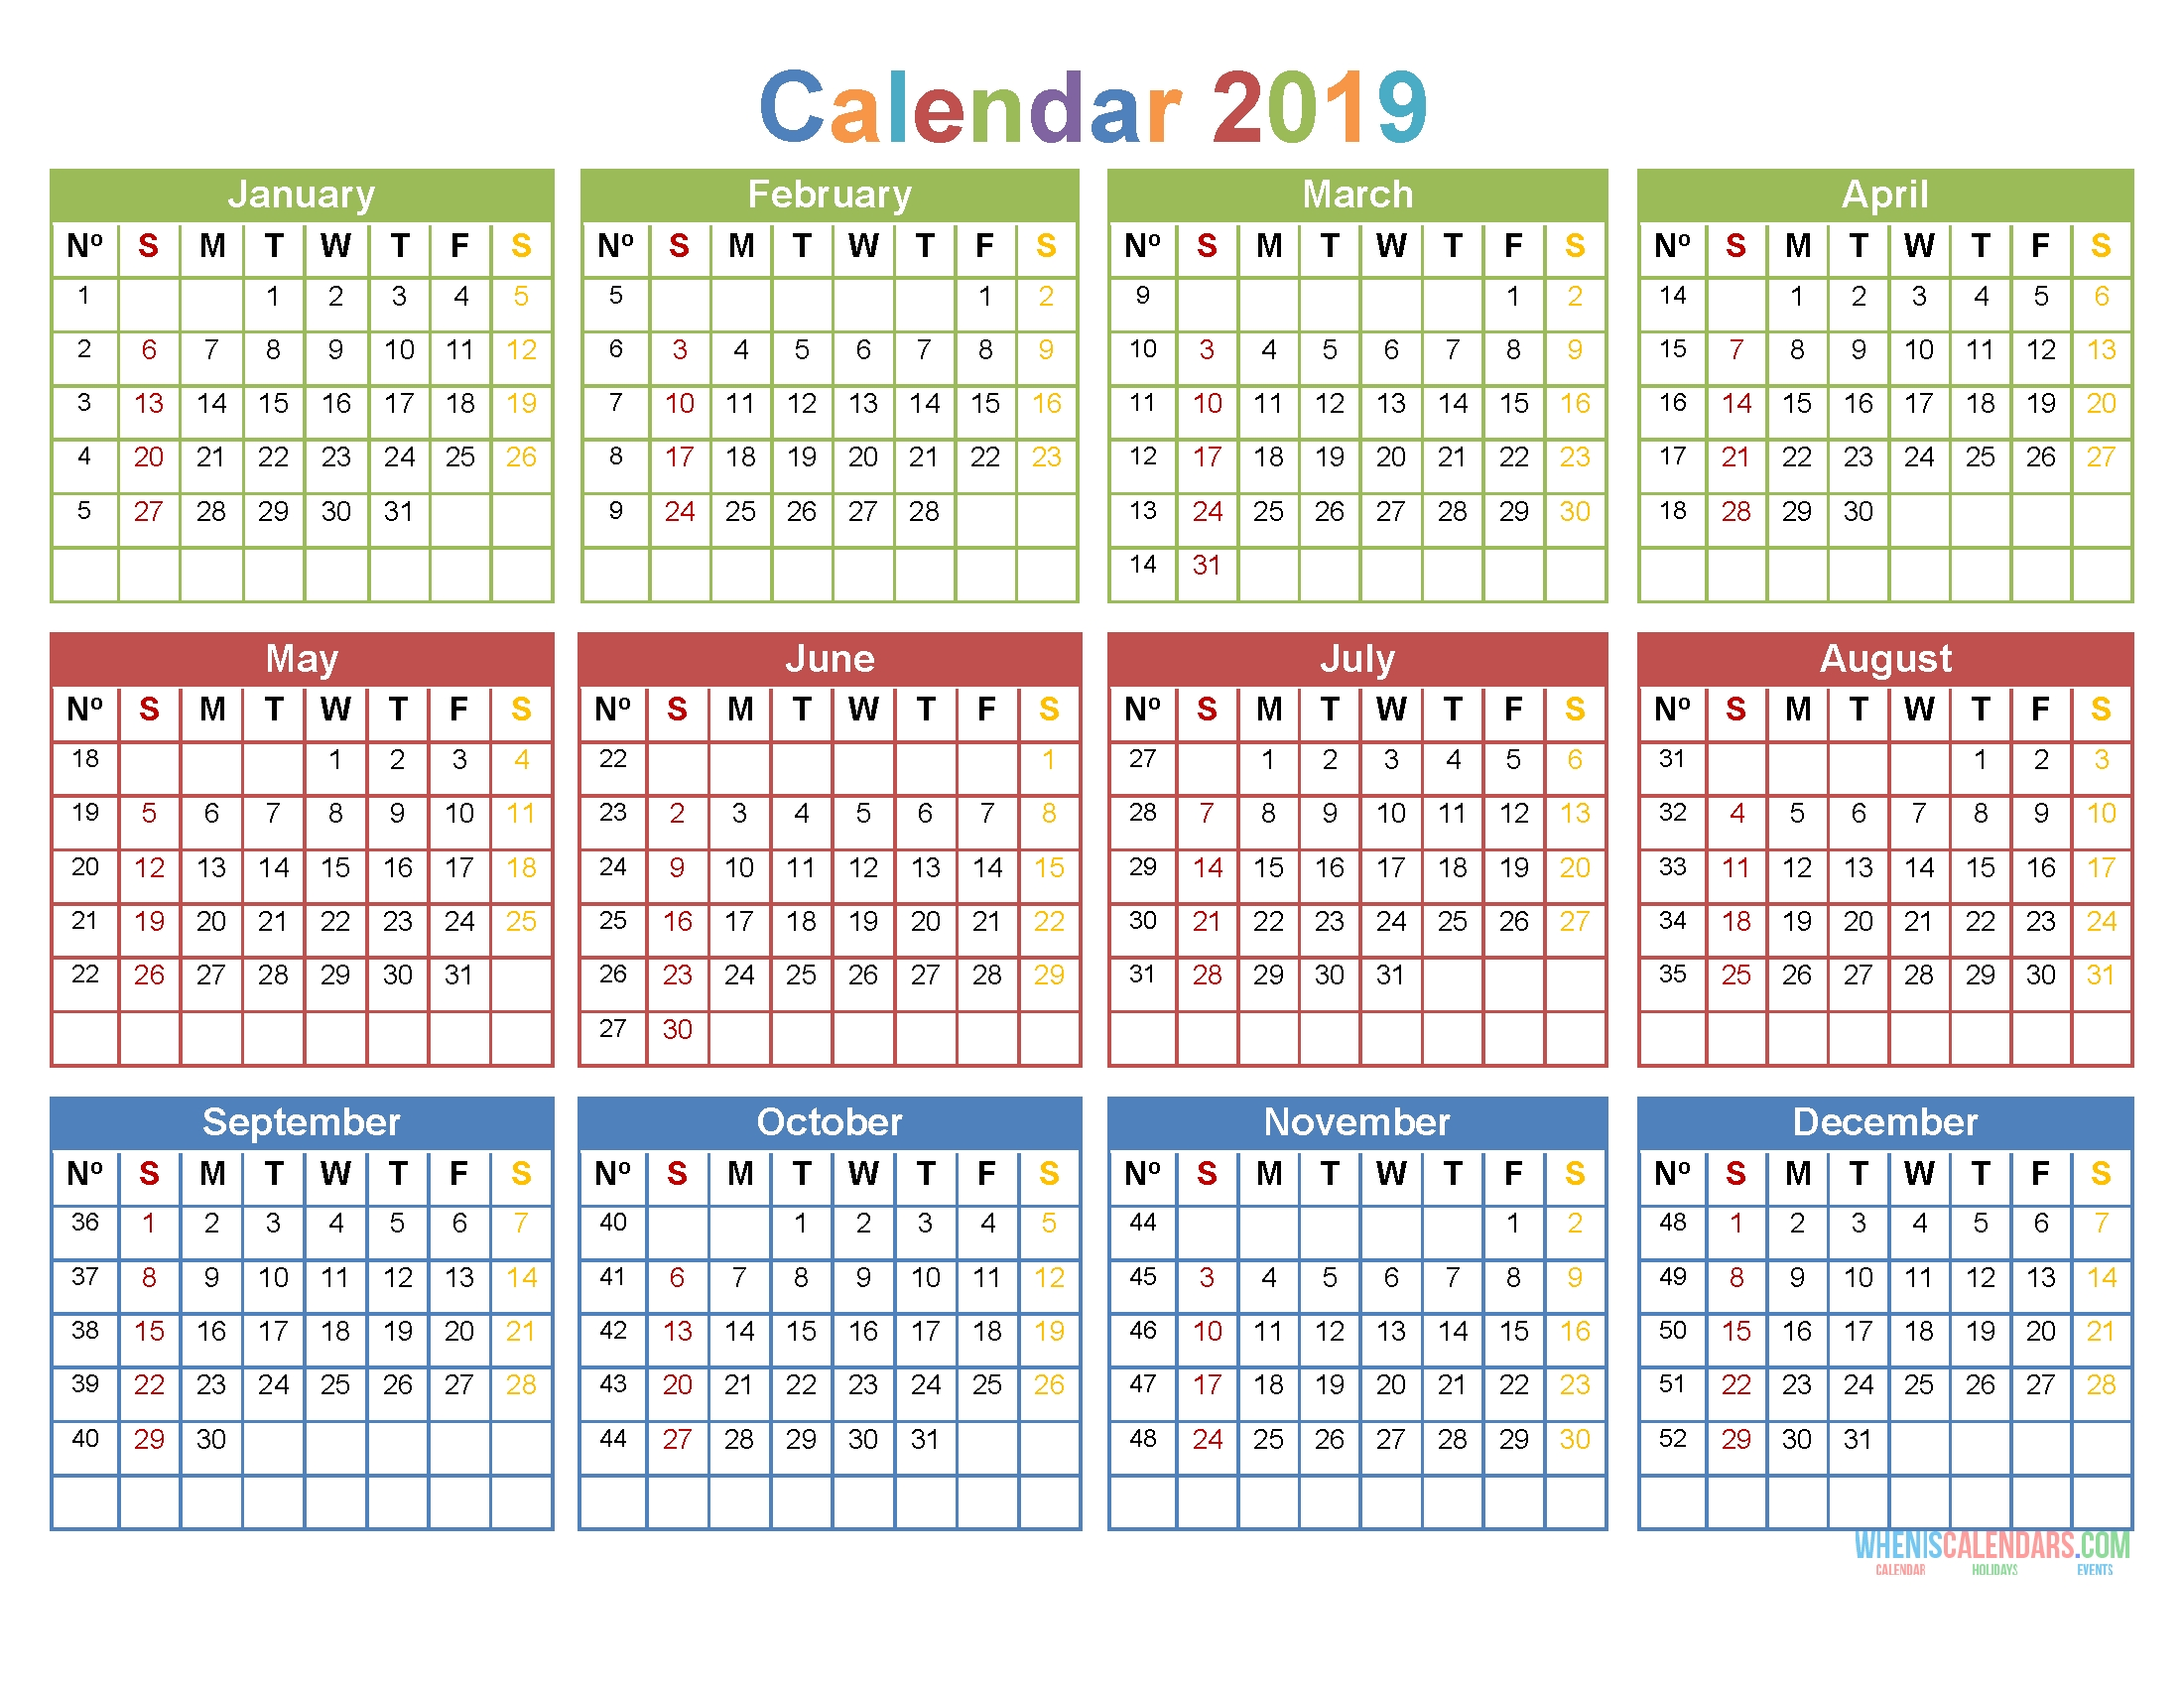 2019 12 Month Calendar Template Large Print Calendar Pdf Image 4c3r S1rb321